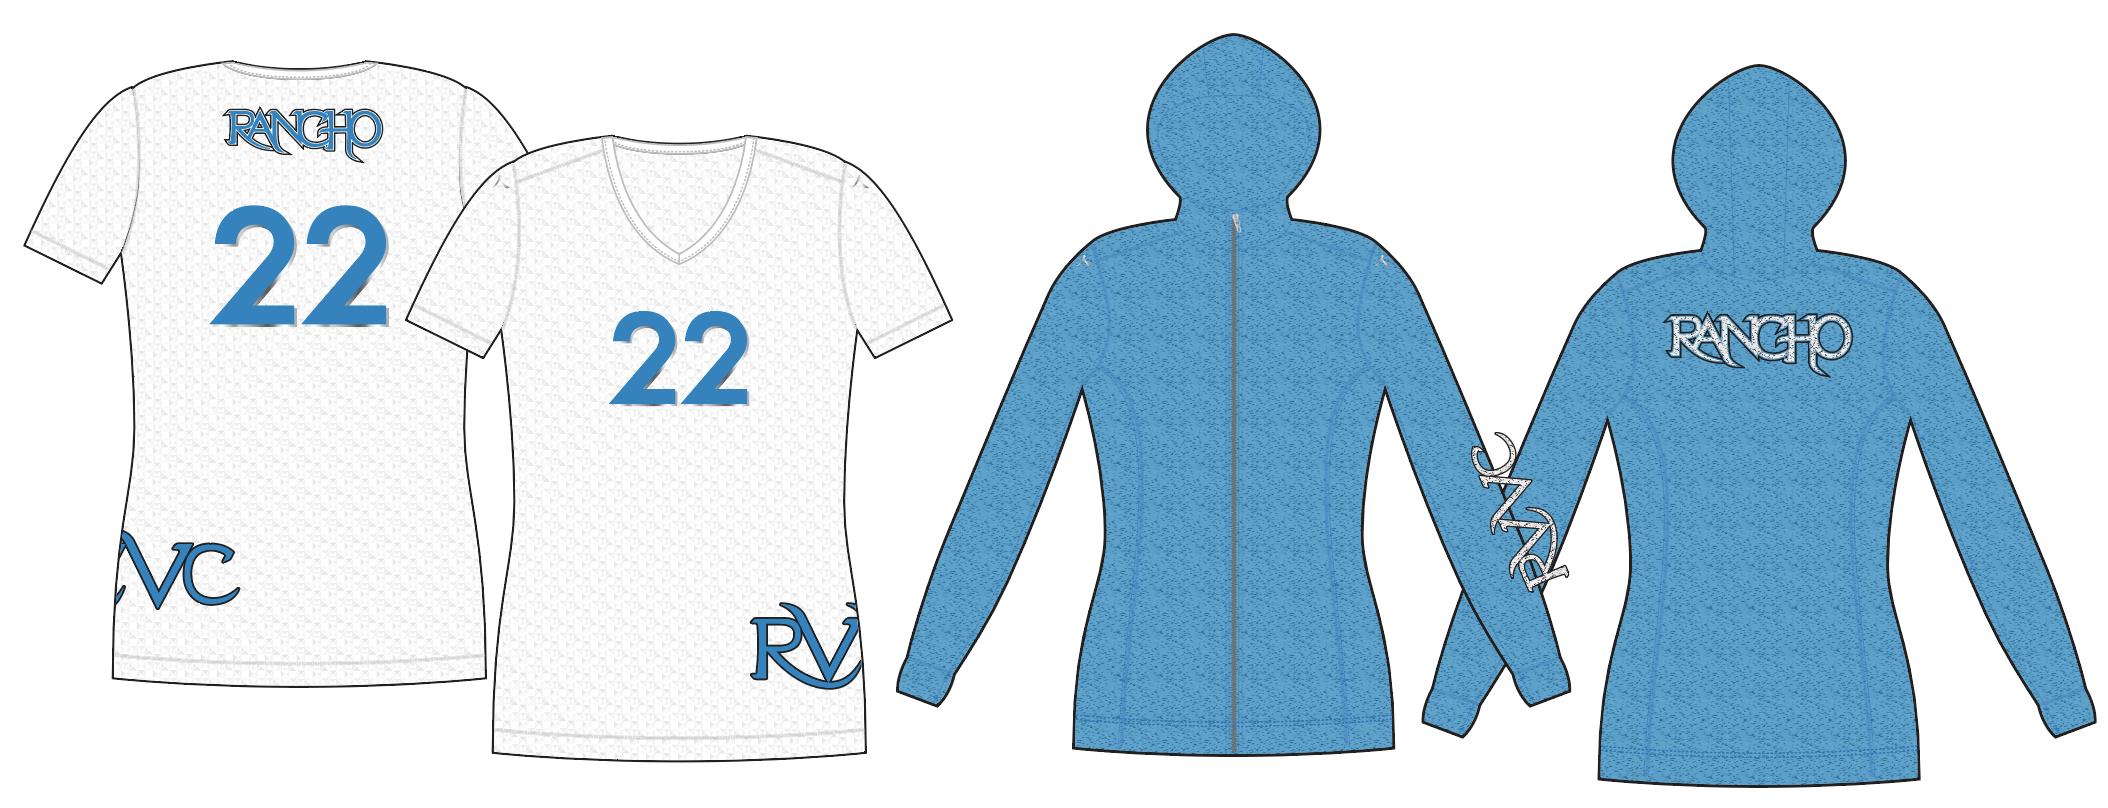 RVVC Custom Uniforms